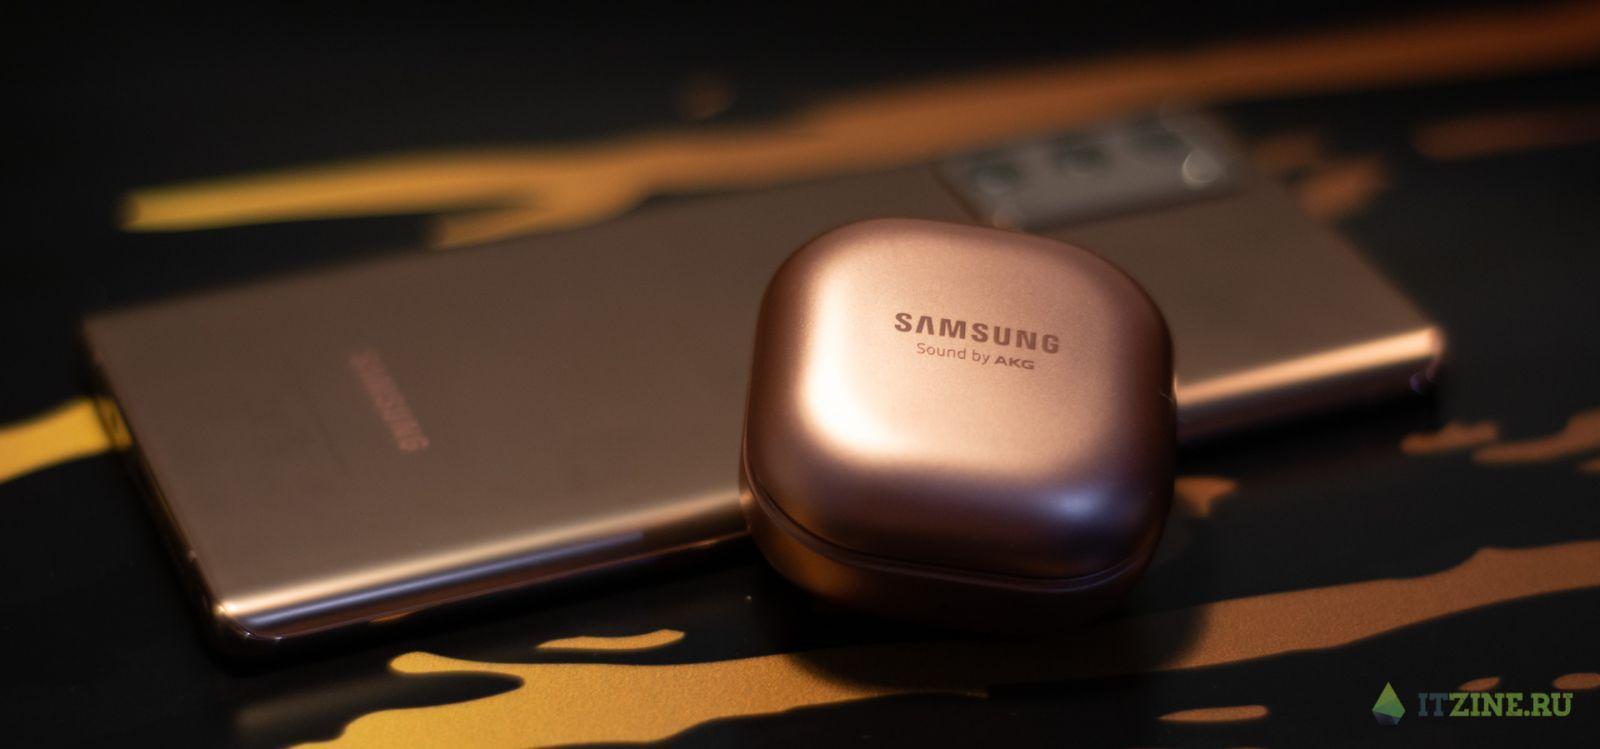 Samsung Galaxy Note20 и Galaxy Buds Live в бронзовой расцветке